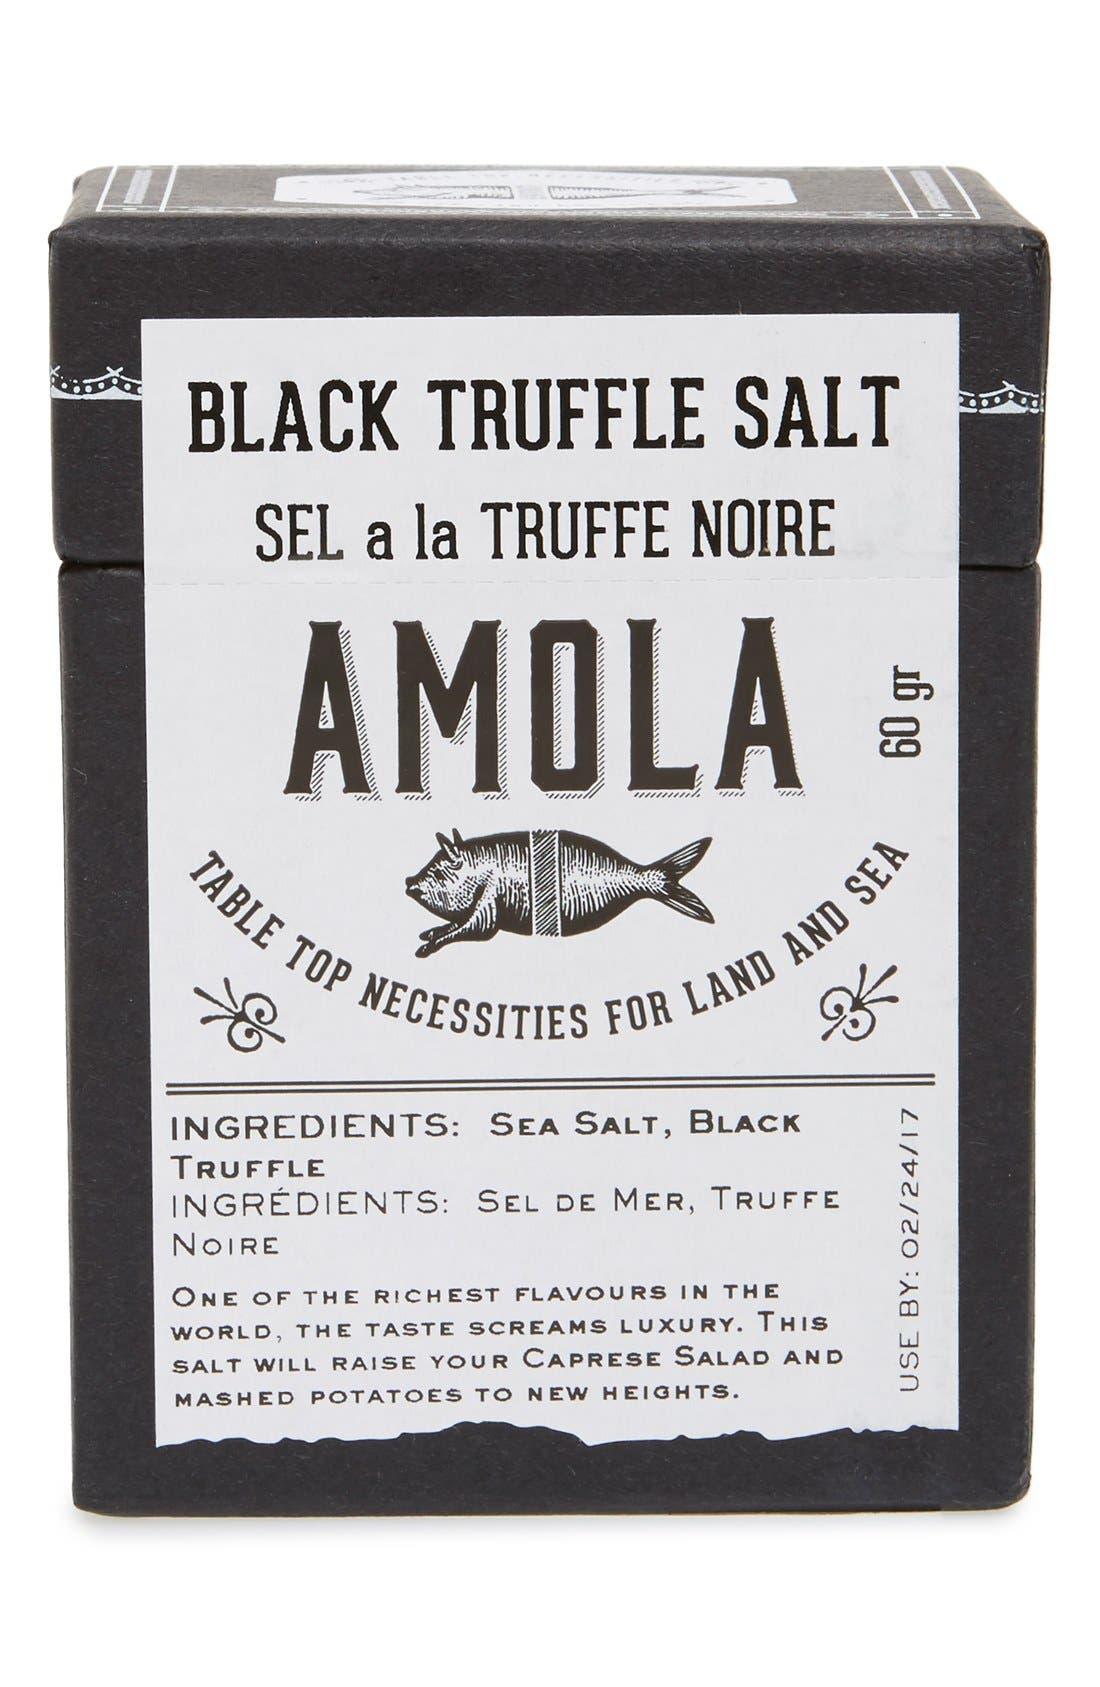 Amola Black Truffle Salt, Main, color, 201